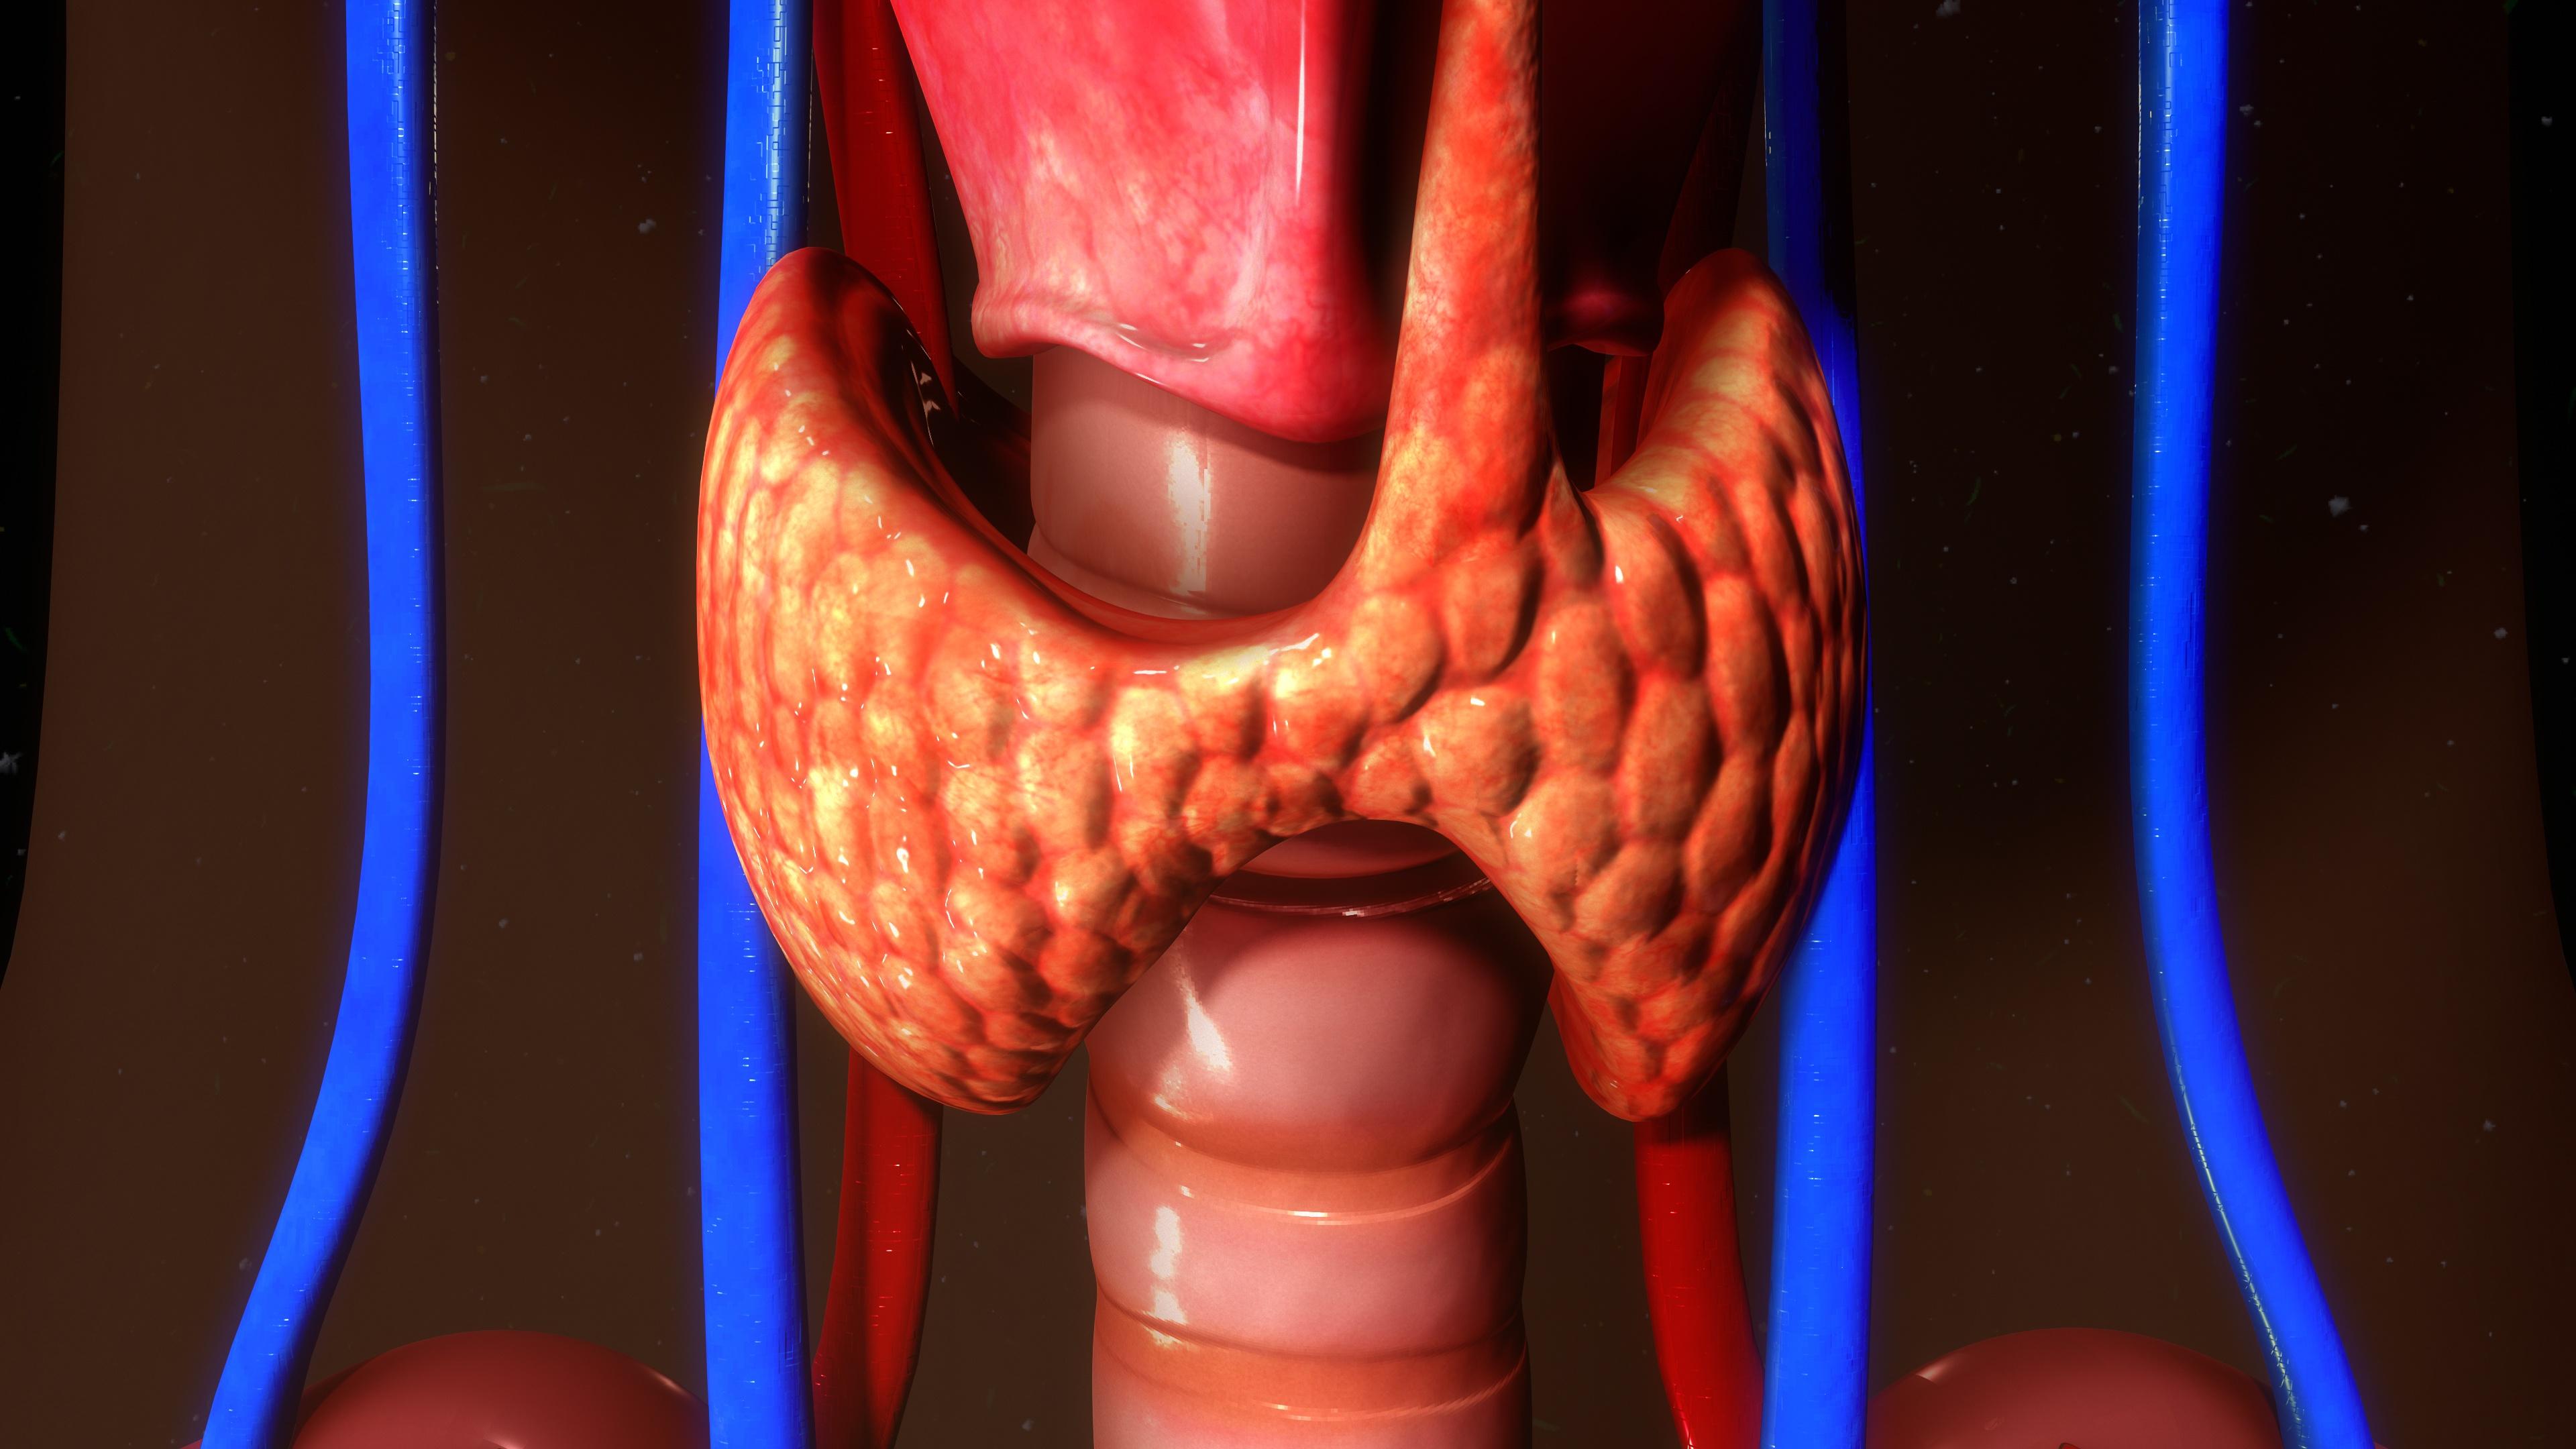 solitary thyroid nodule